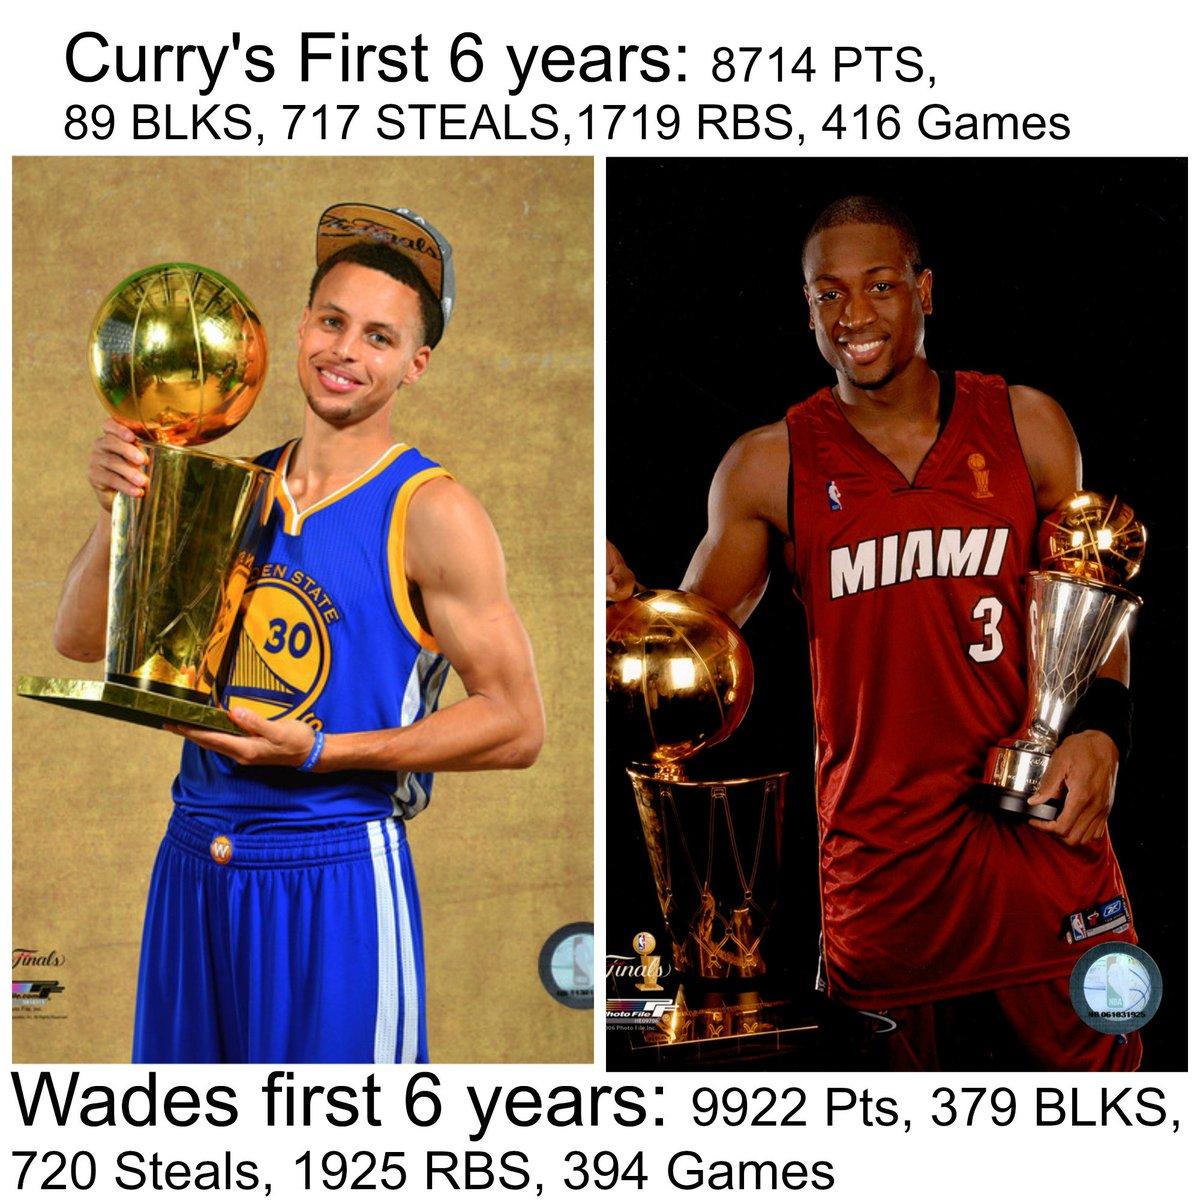 @DontHateTheH3at @HeatvsHaters @DwyaneWade @DwyaneWade @itsgabrielleu @MiamiHEAT @NBA https://t.co/4CwVLyccUS